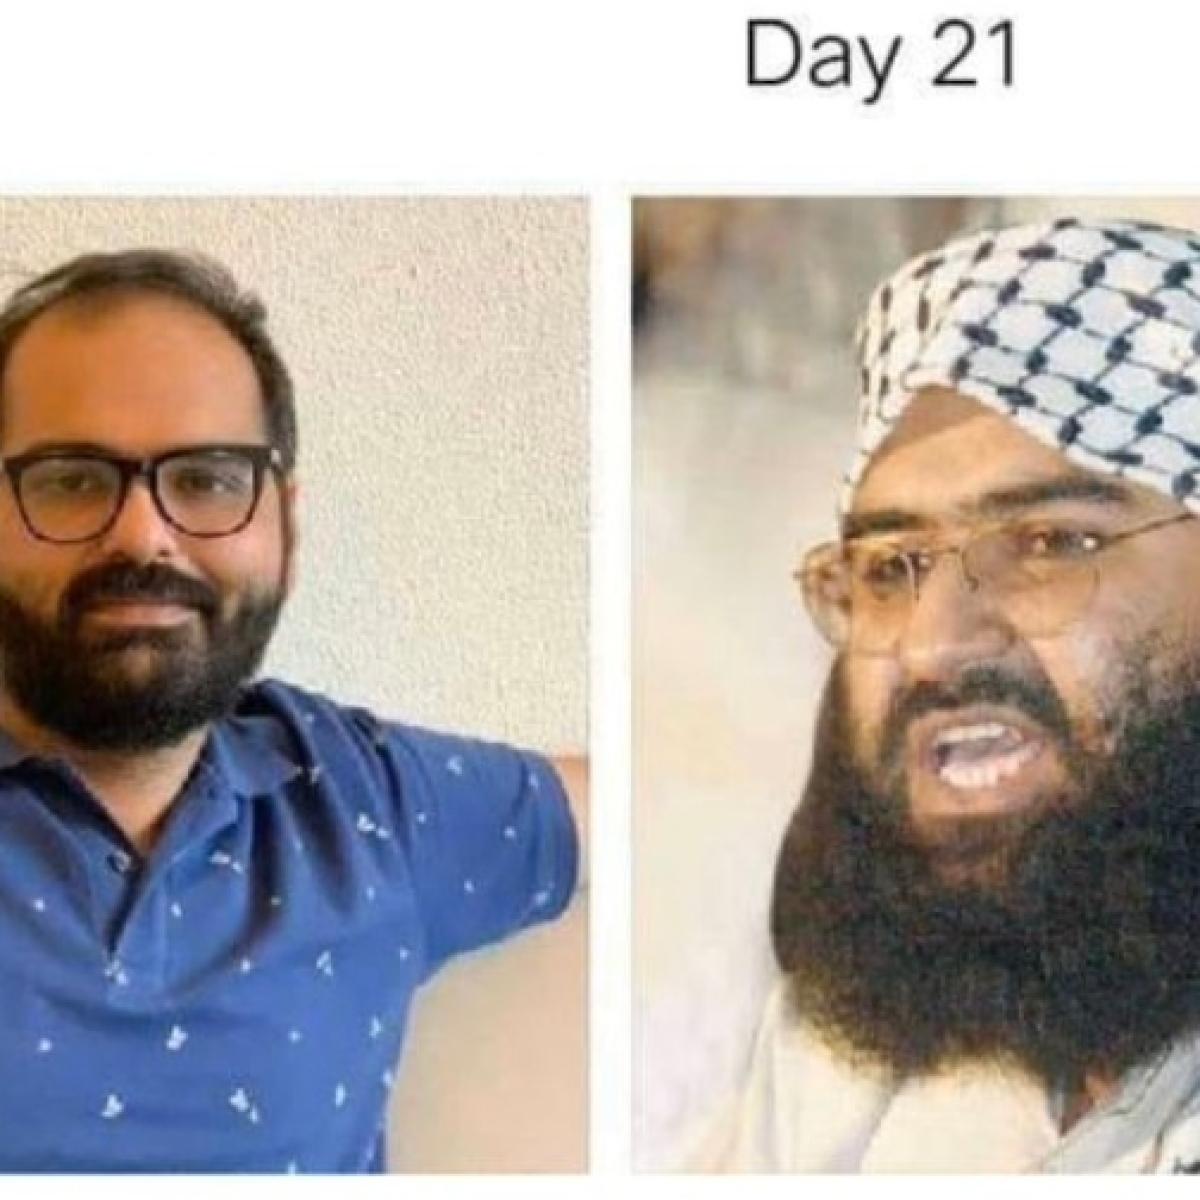 Kunal Kamra reacts to lockdown meme comparing him  to terrorist Masood Azhar